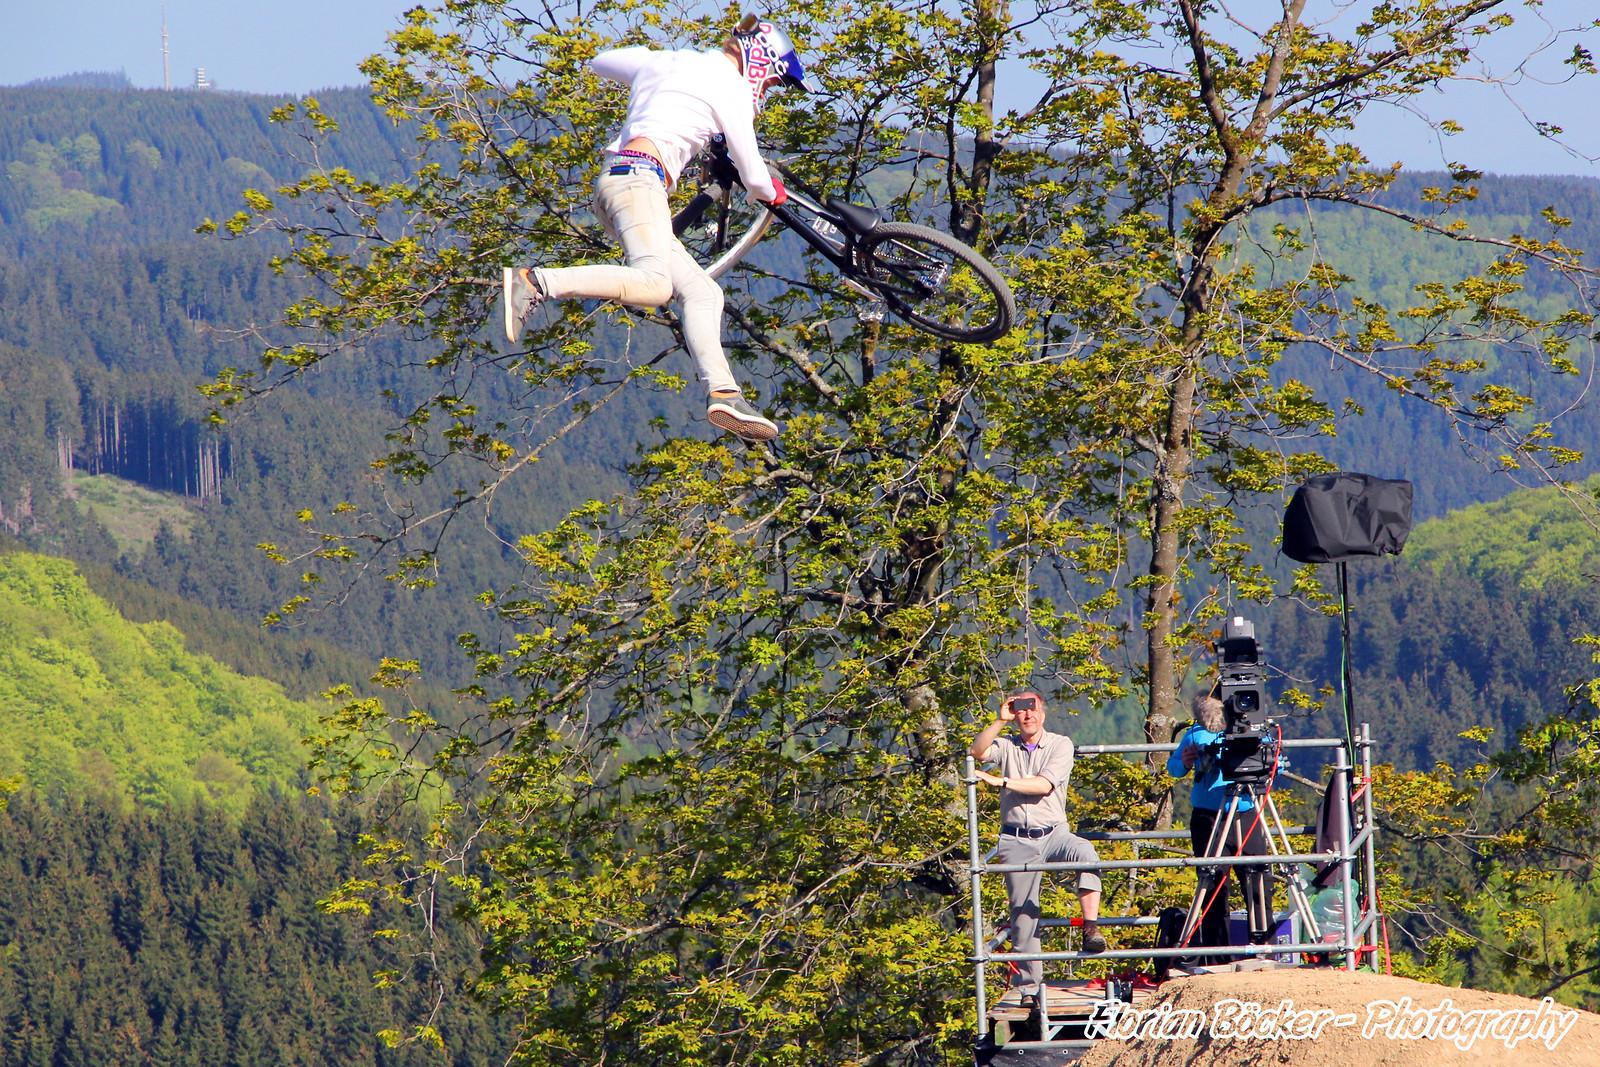 Red Bull Bergline - Winterberg 2013 - florian.boecker228 - Mountain Biking Pictures - Vital MTB